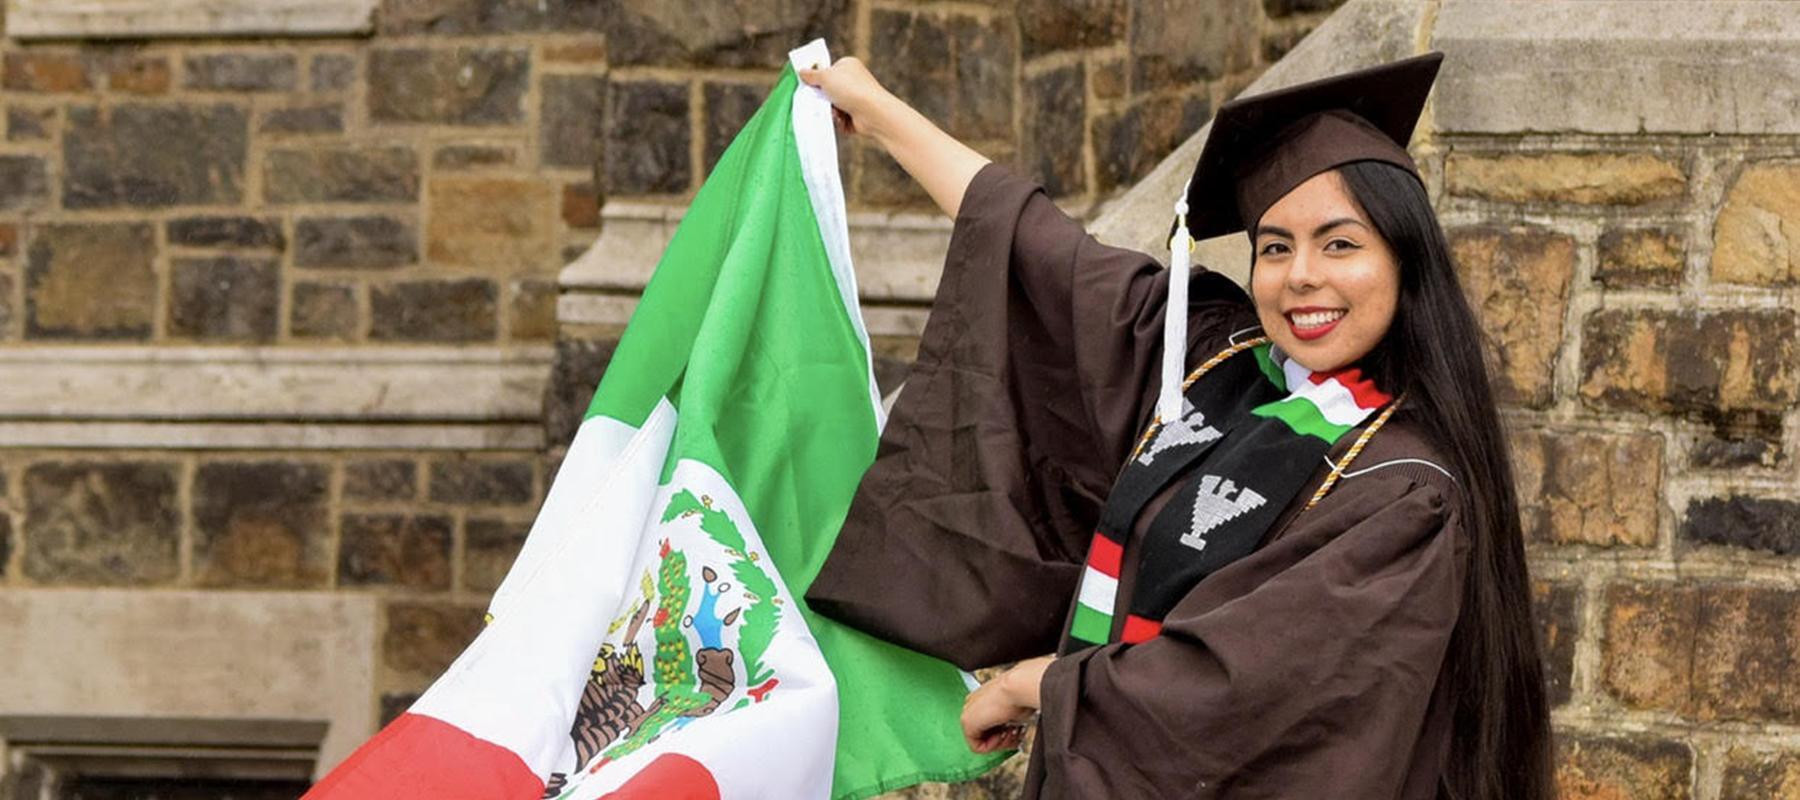 Diana Rivas Garcia preparing for graduation